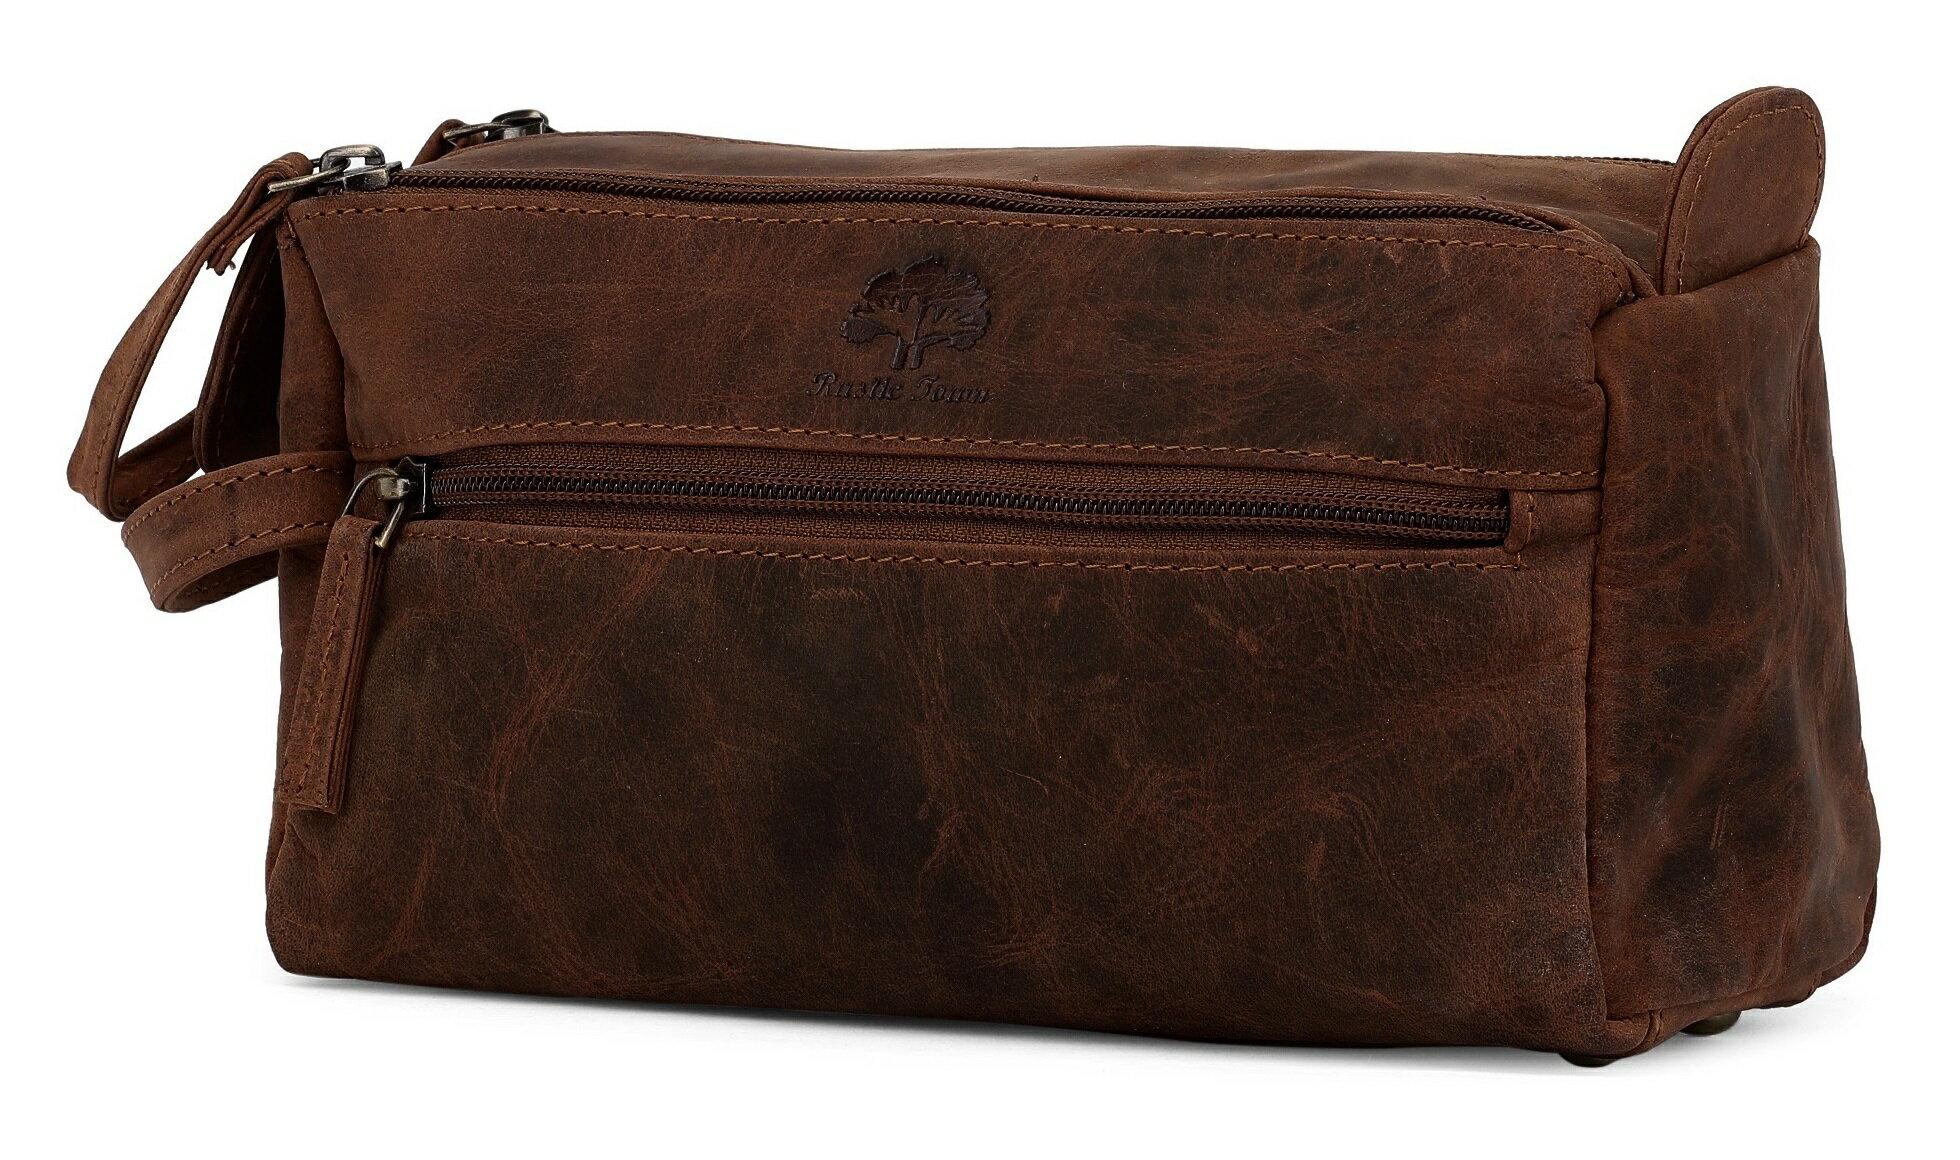 Genuine Leather Travel Toiletry Bag - Hygiene Organizer Dopp Kit By Rustic  Town (Dark Brown 3ea6610312ba8